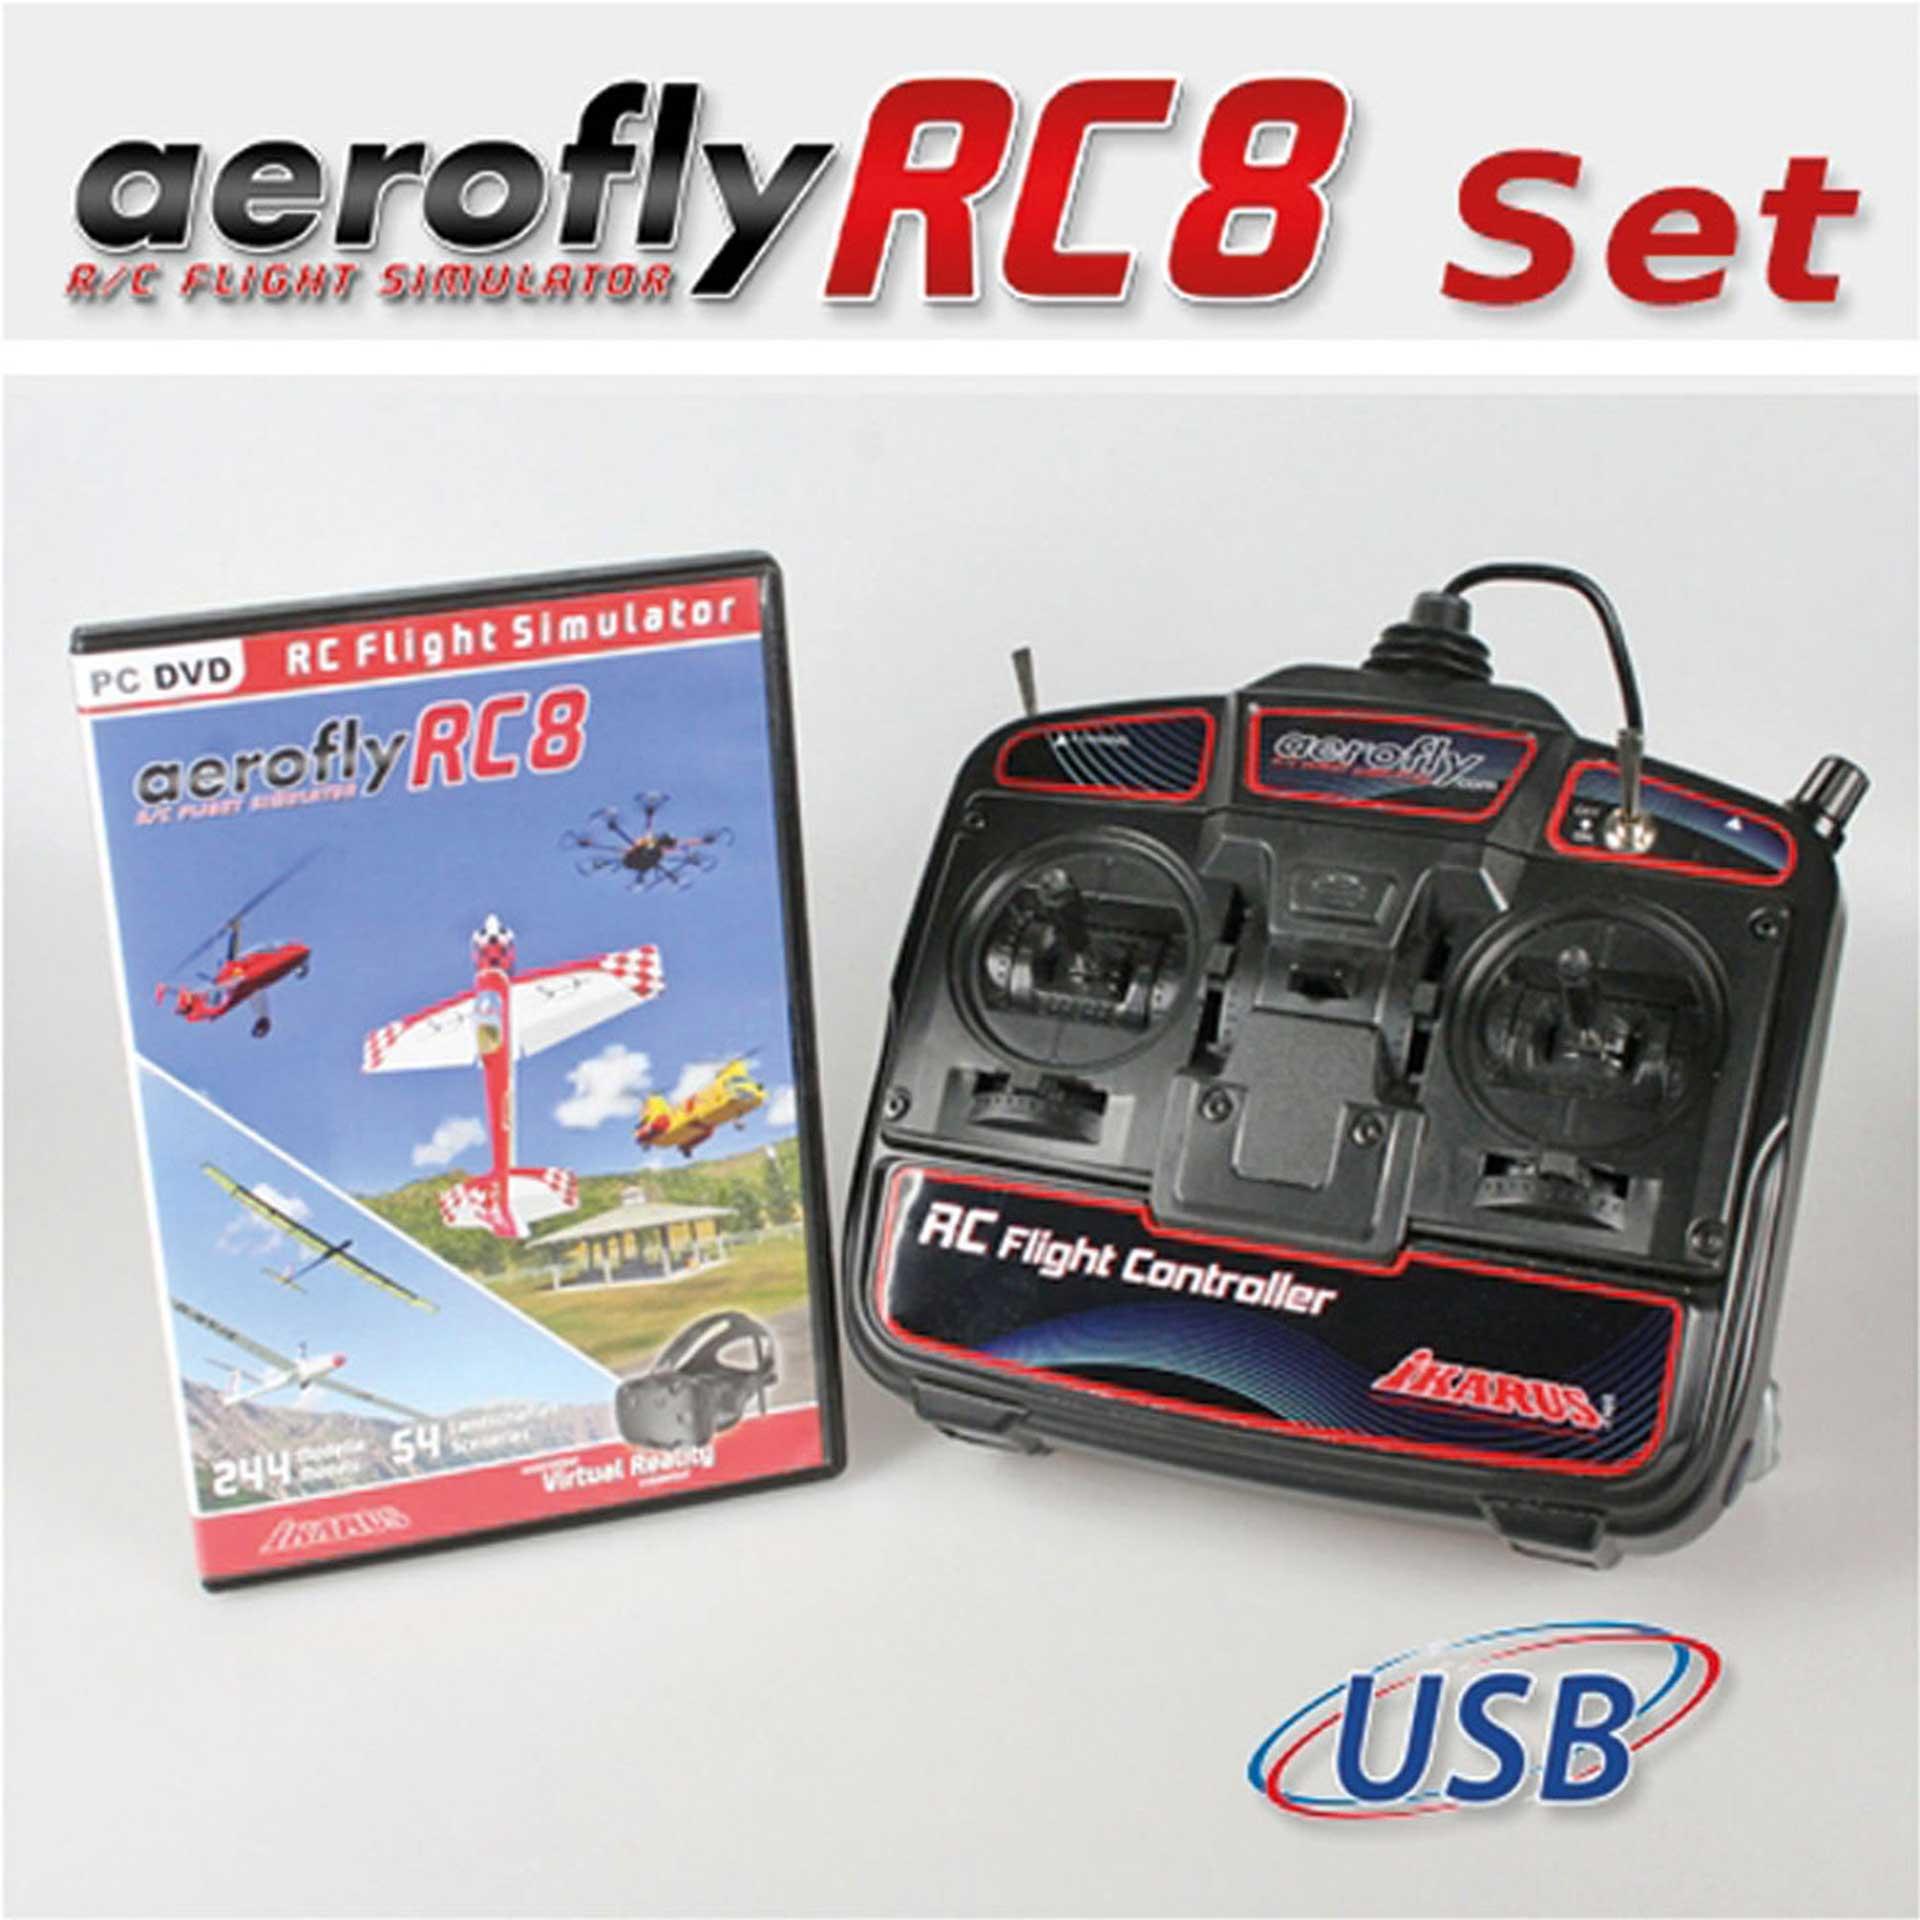 IKARUS AEROFLYRC8 WITH USB-FLIGHTCONTROL UNIT